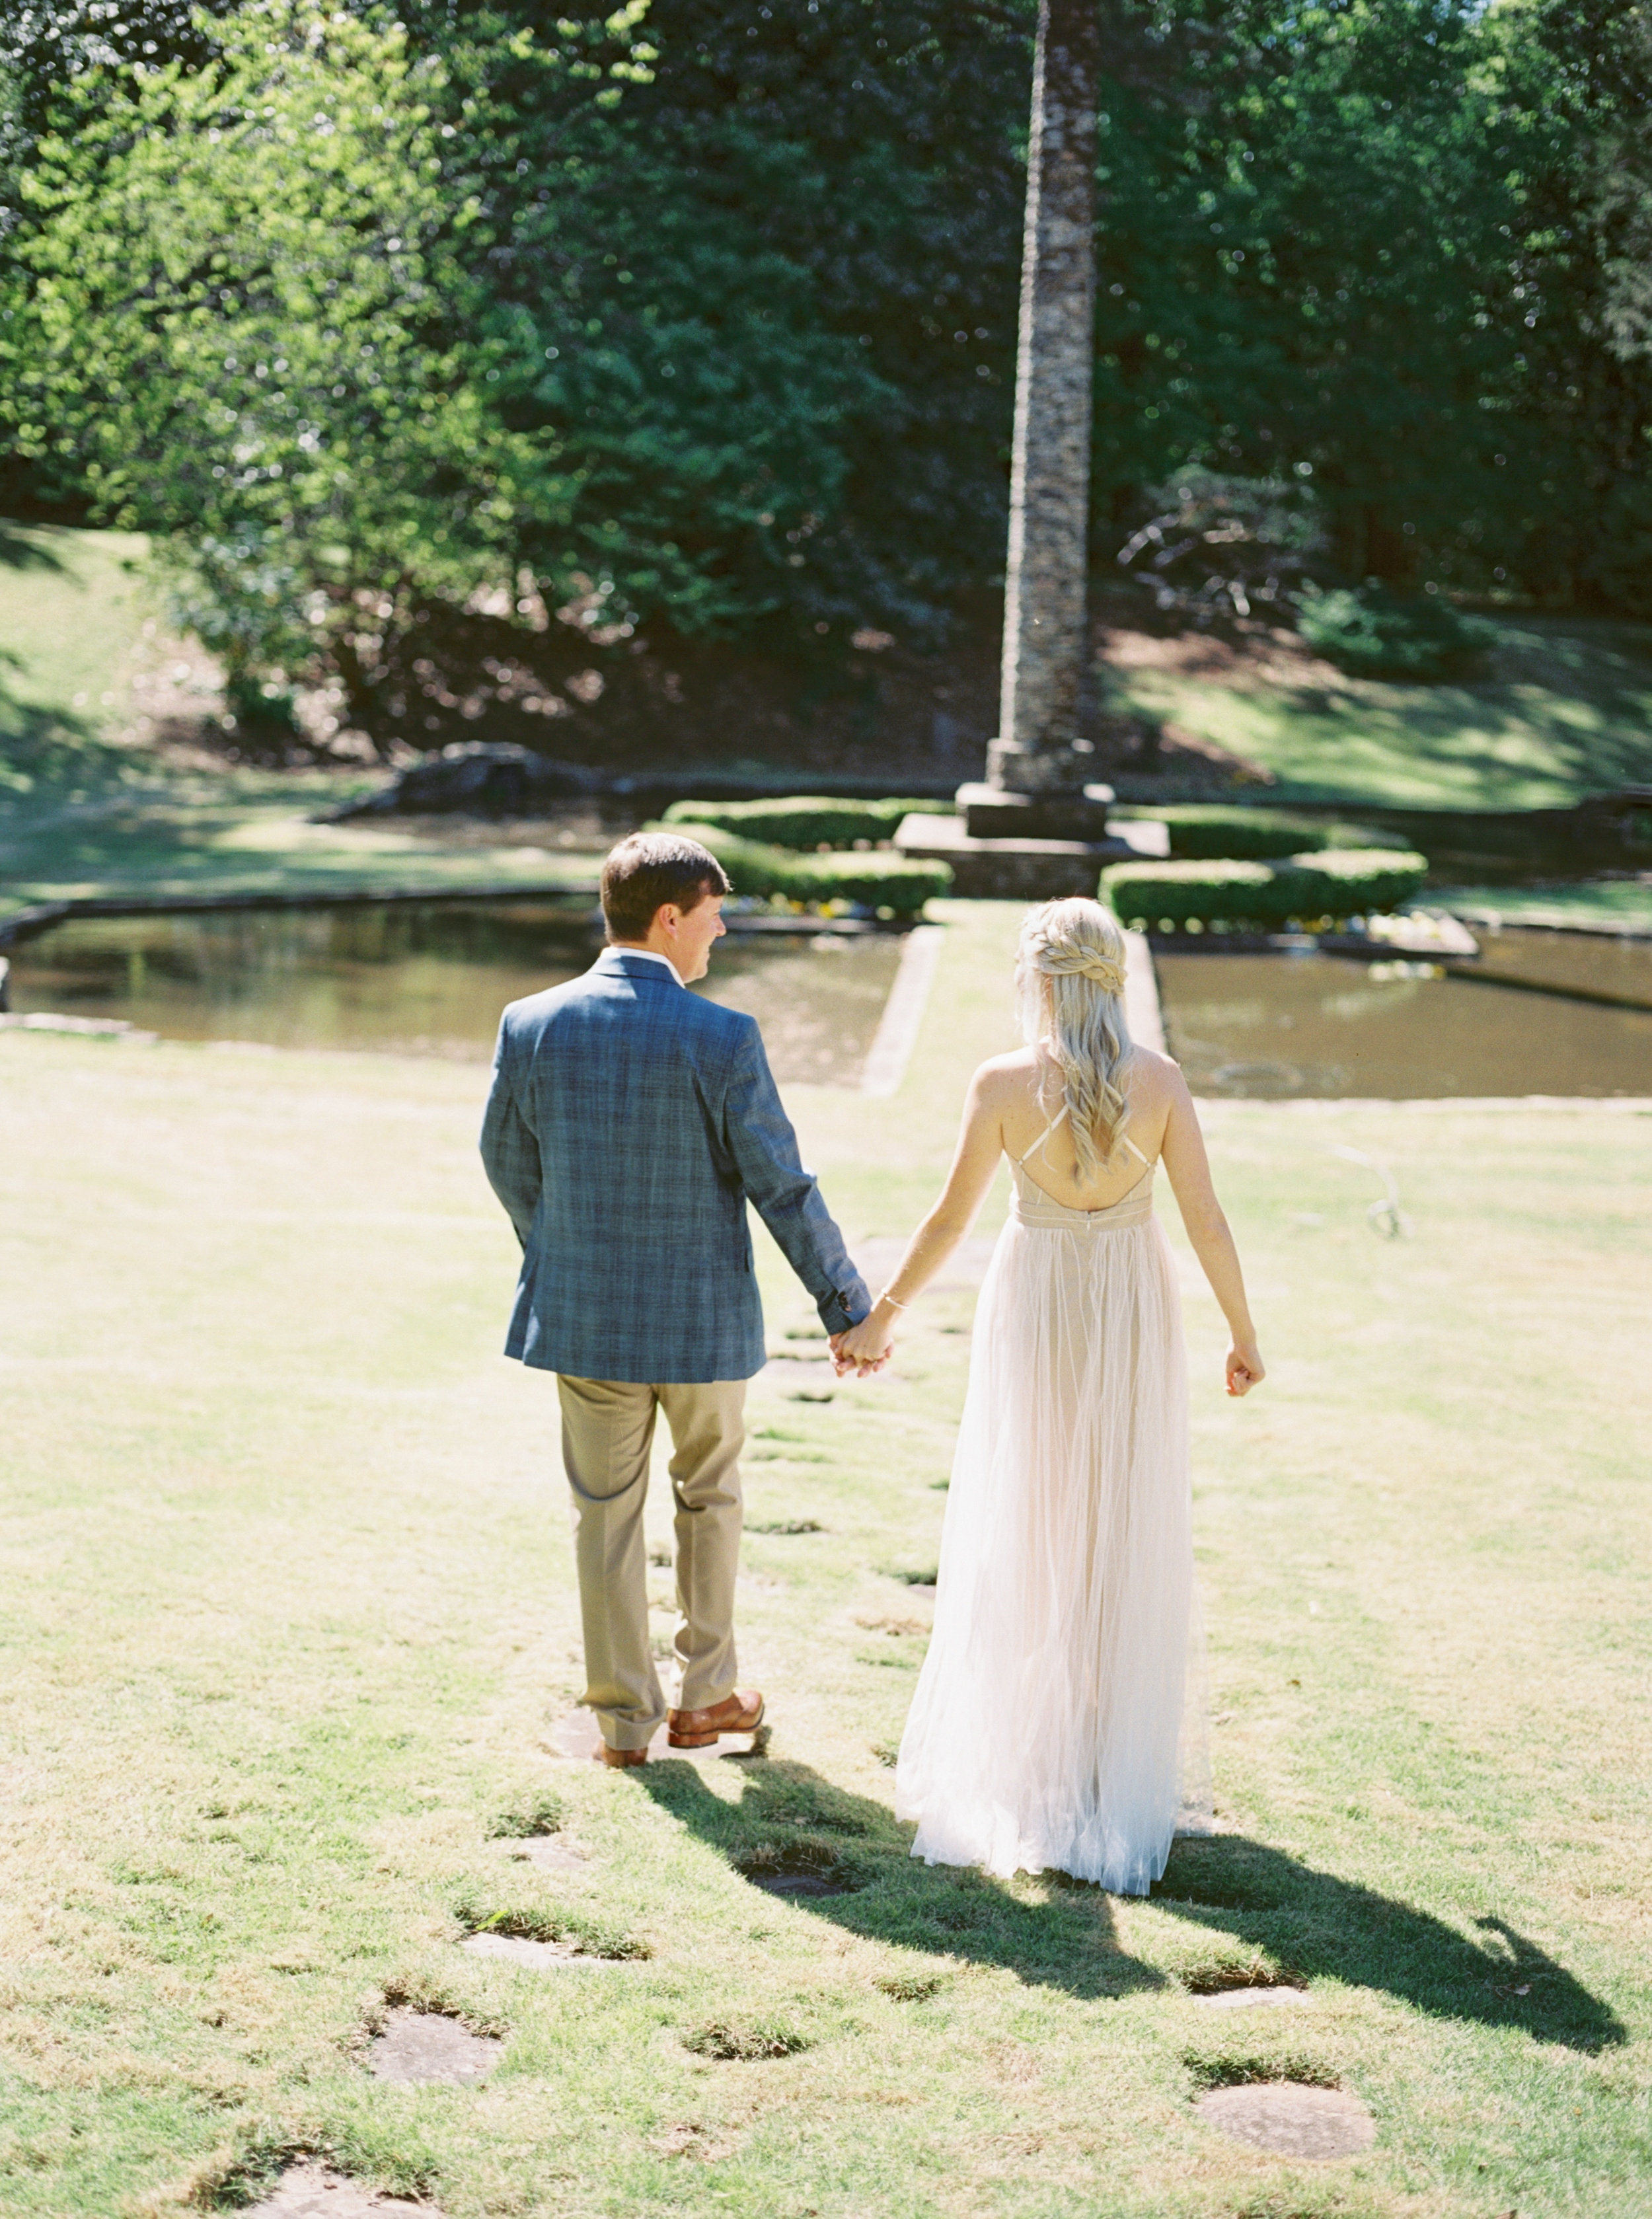 Erin_Johnny_Engagement_Dunaway_Gardens_Georgia_Film_Fallen_Photography-2.JPG